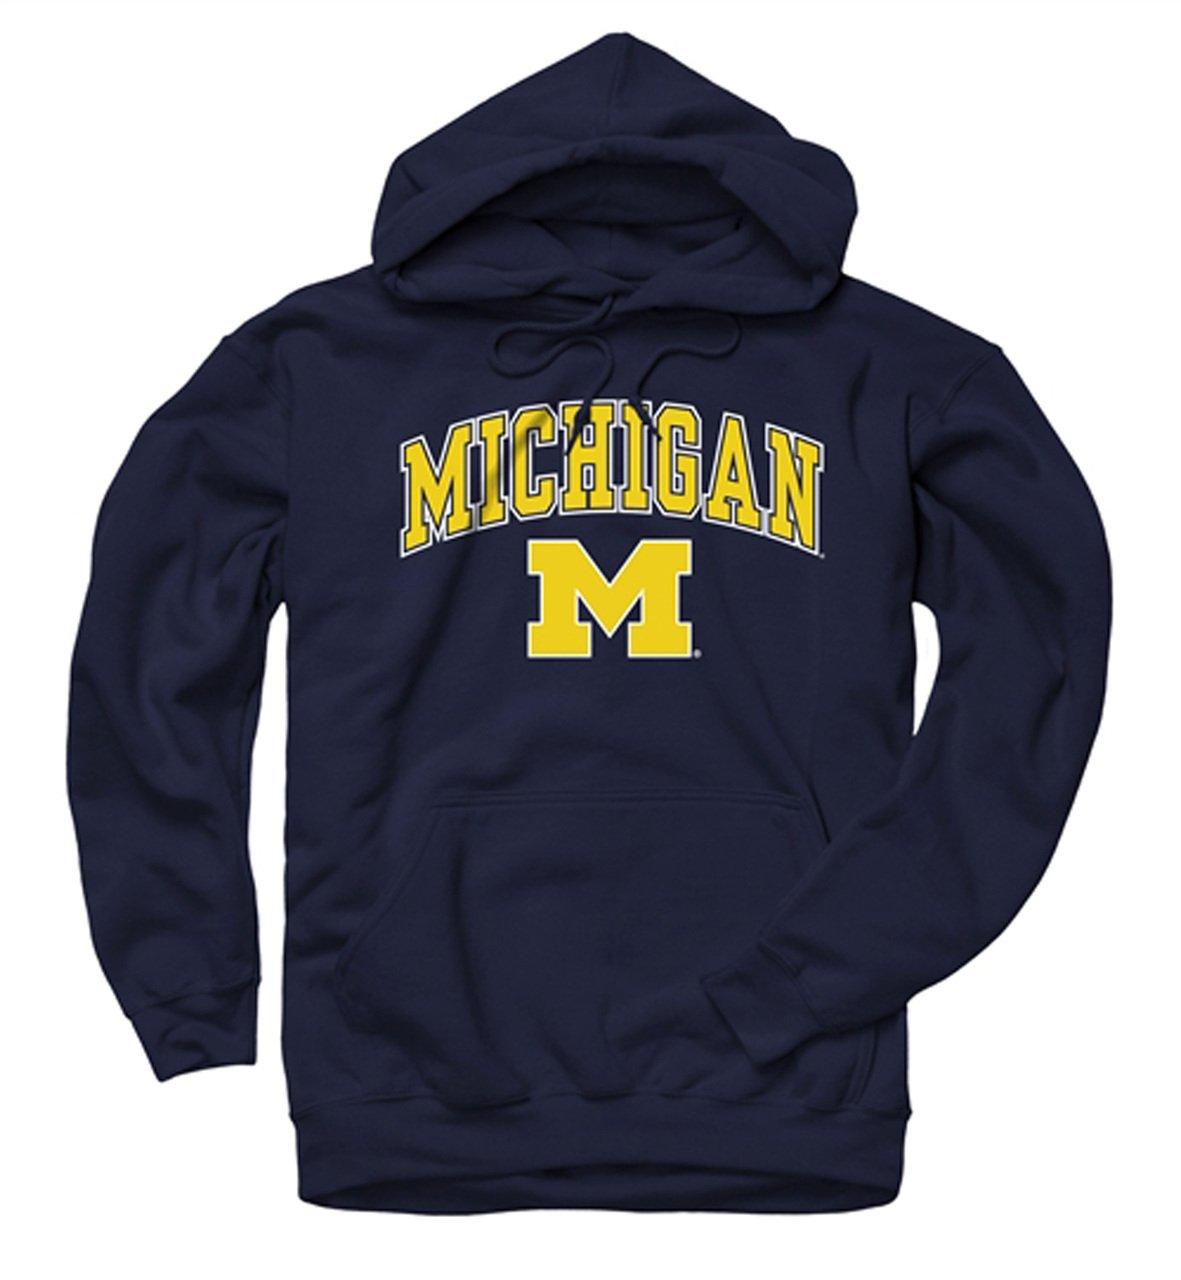 Campus Colors Michigan Wolverine Midsize Logo Hooded Sweatshirt, Medium